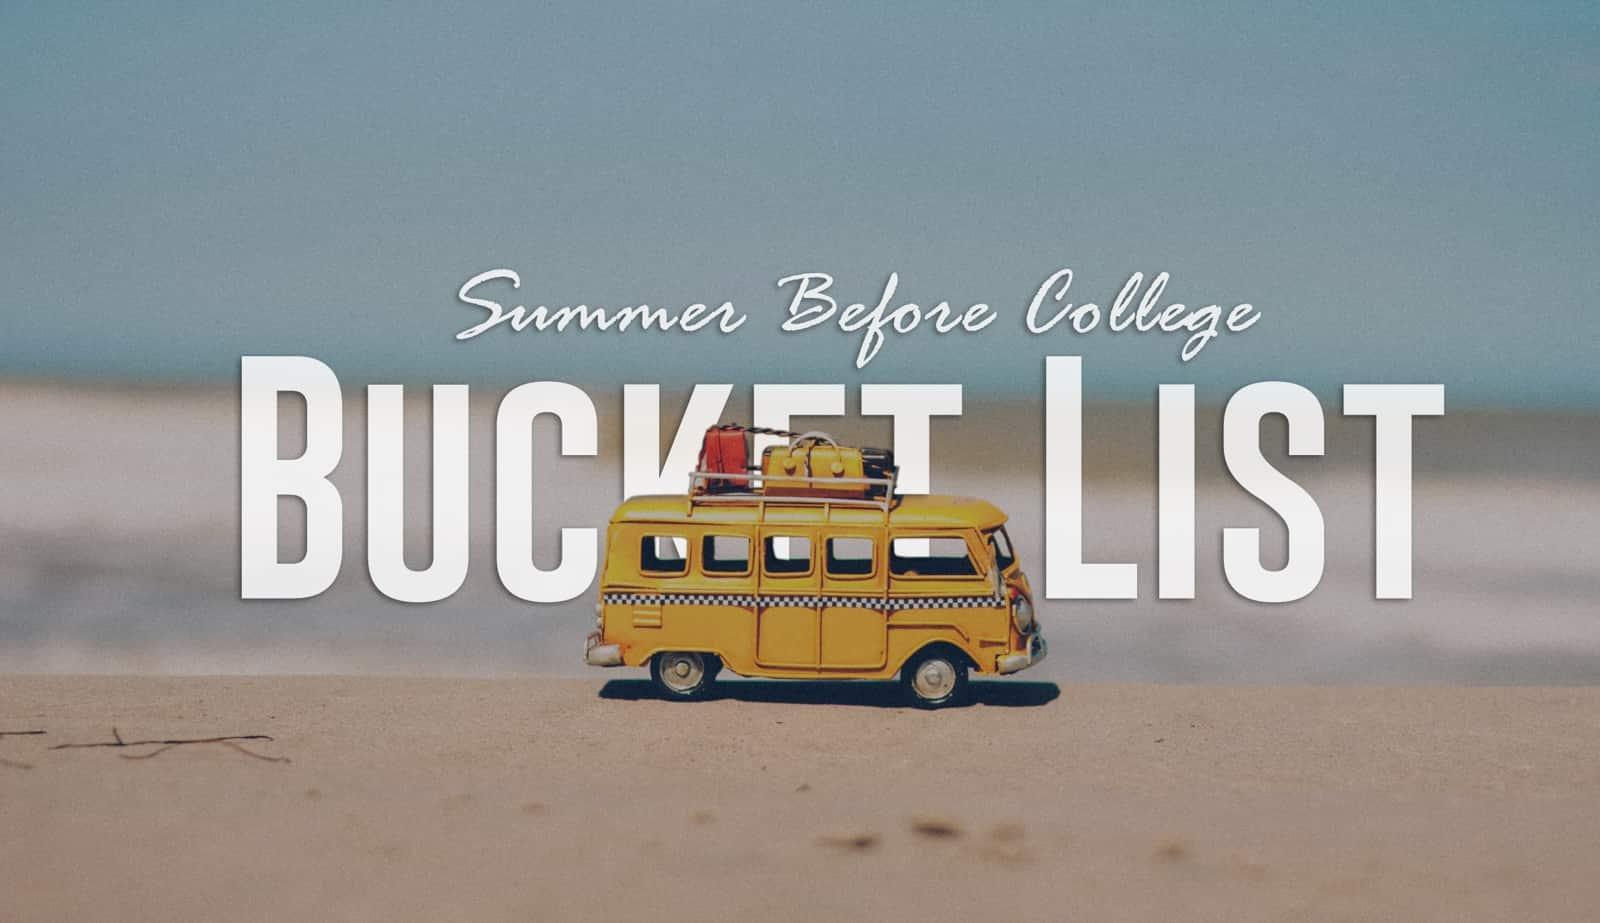 Summer Before College Bucket List